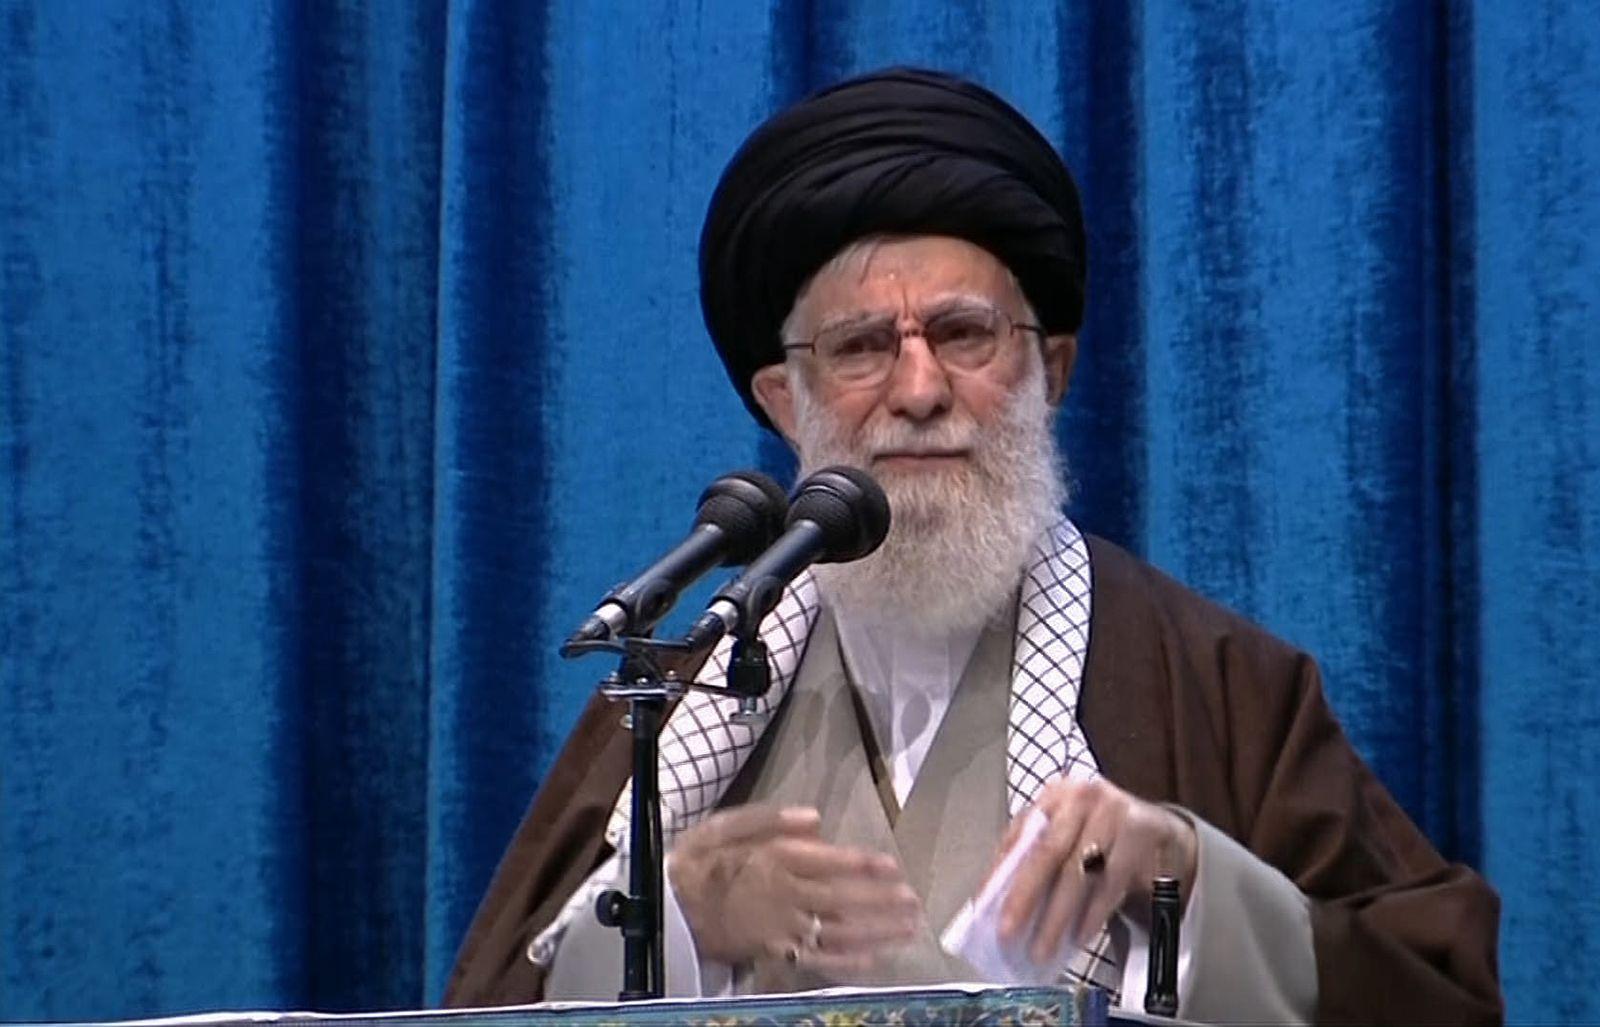 IRAN-POLITICS-PRAYER